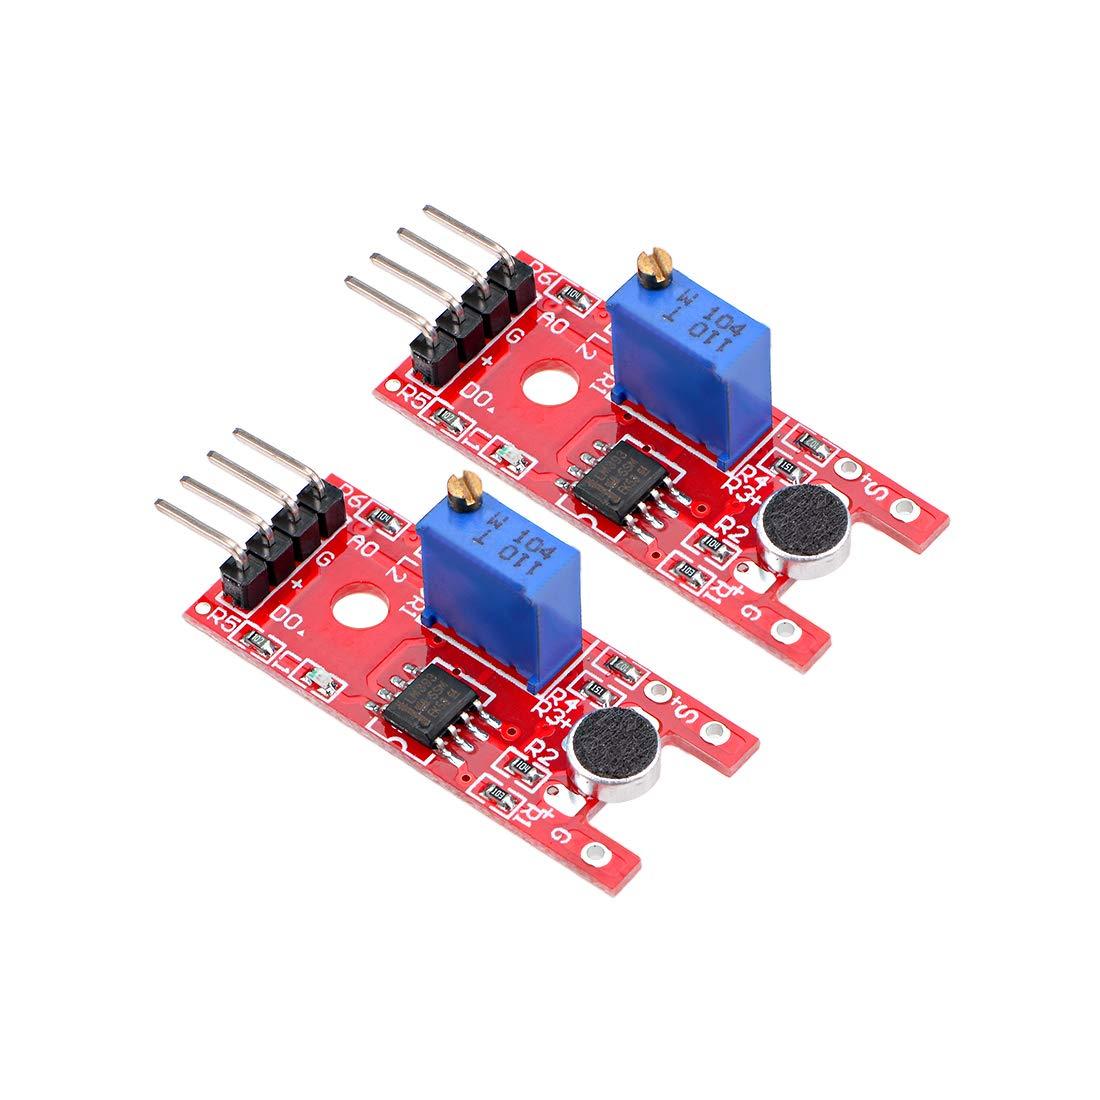 2PCS Microphone Sensor AVR PIC High Sensitivity Sound Detection Module Arduino